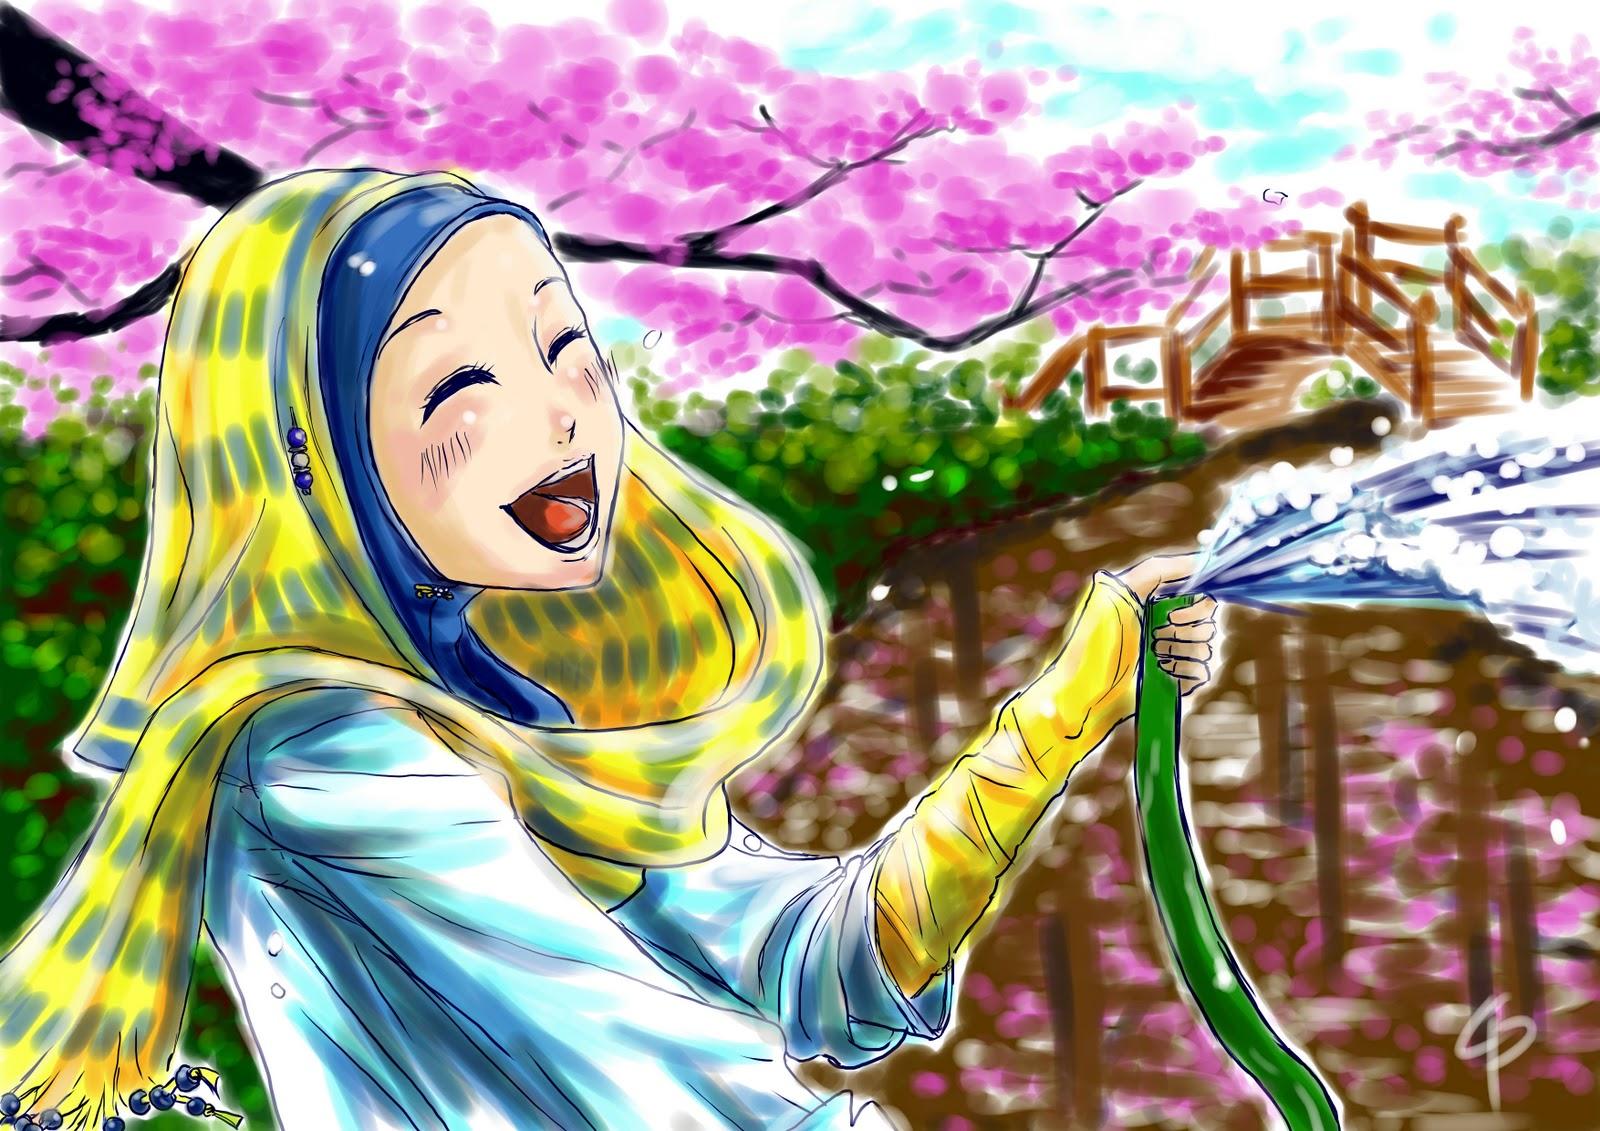 ... Muslimah http://www.hawaiidermatology.com/wallpaper/wallpaper-muslimah